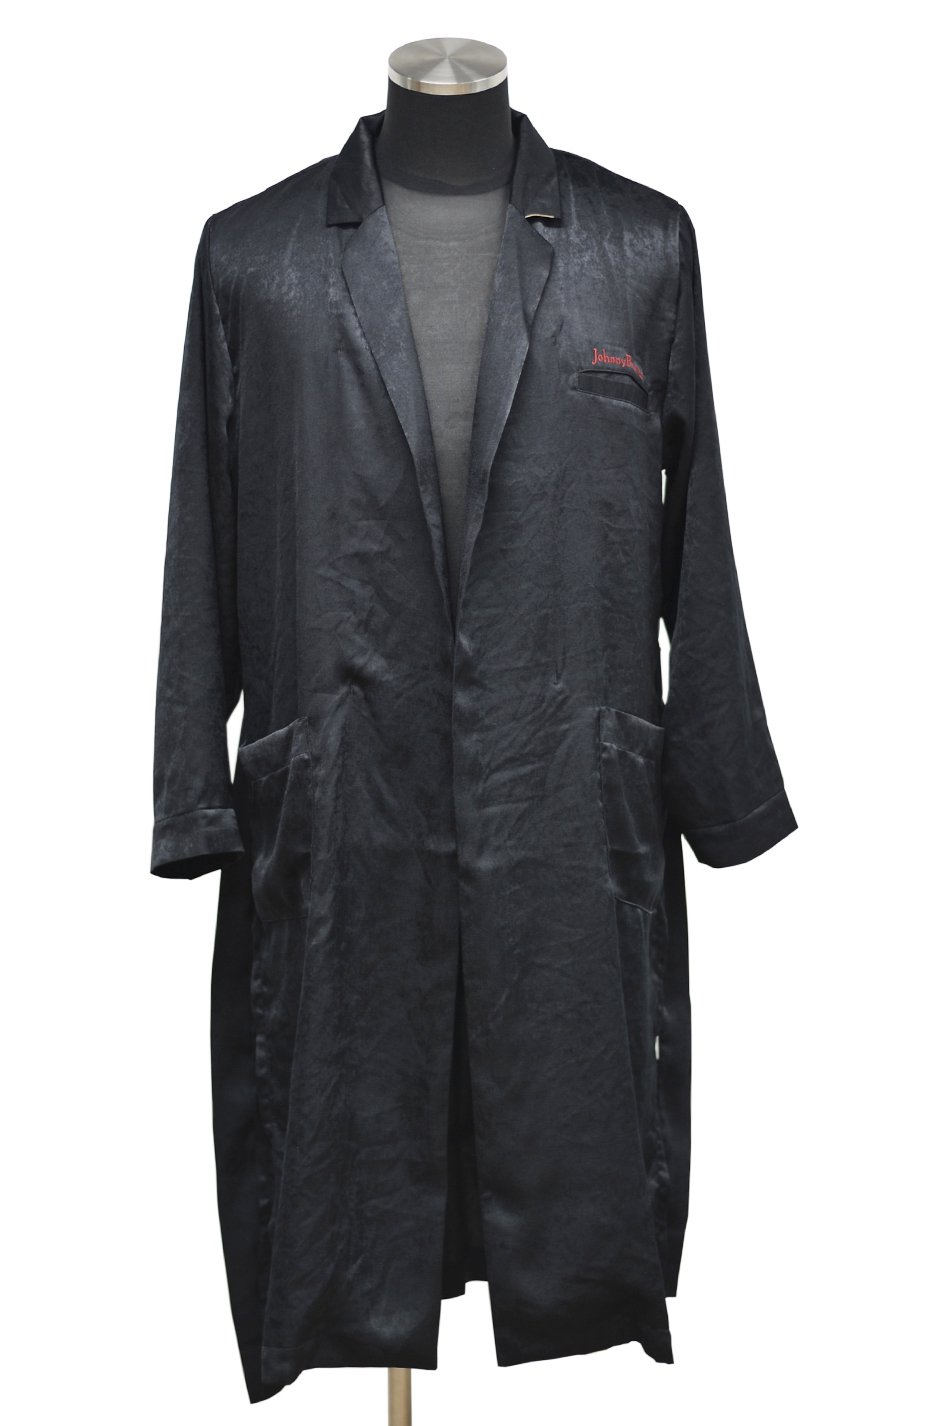 JOHNNY BUSINESS(ジョニービジネス ) HAWOL Gown Coat / Black